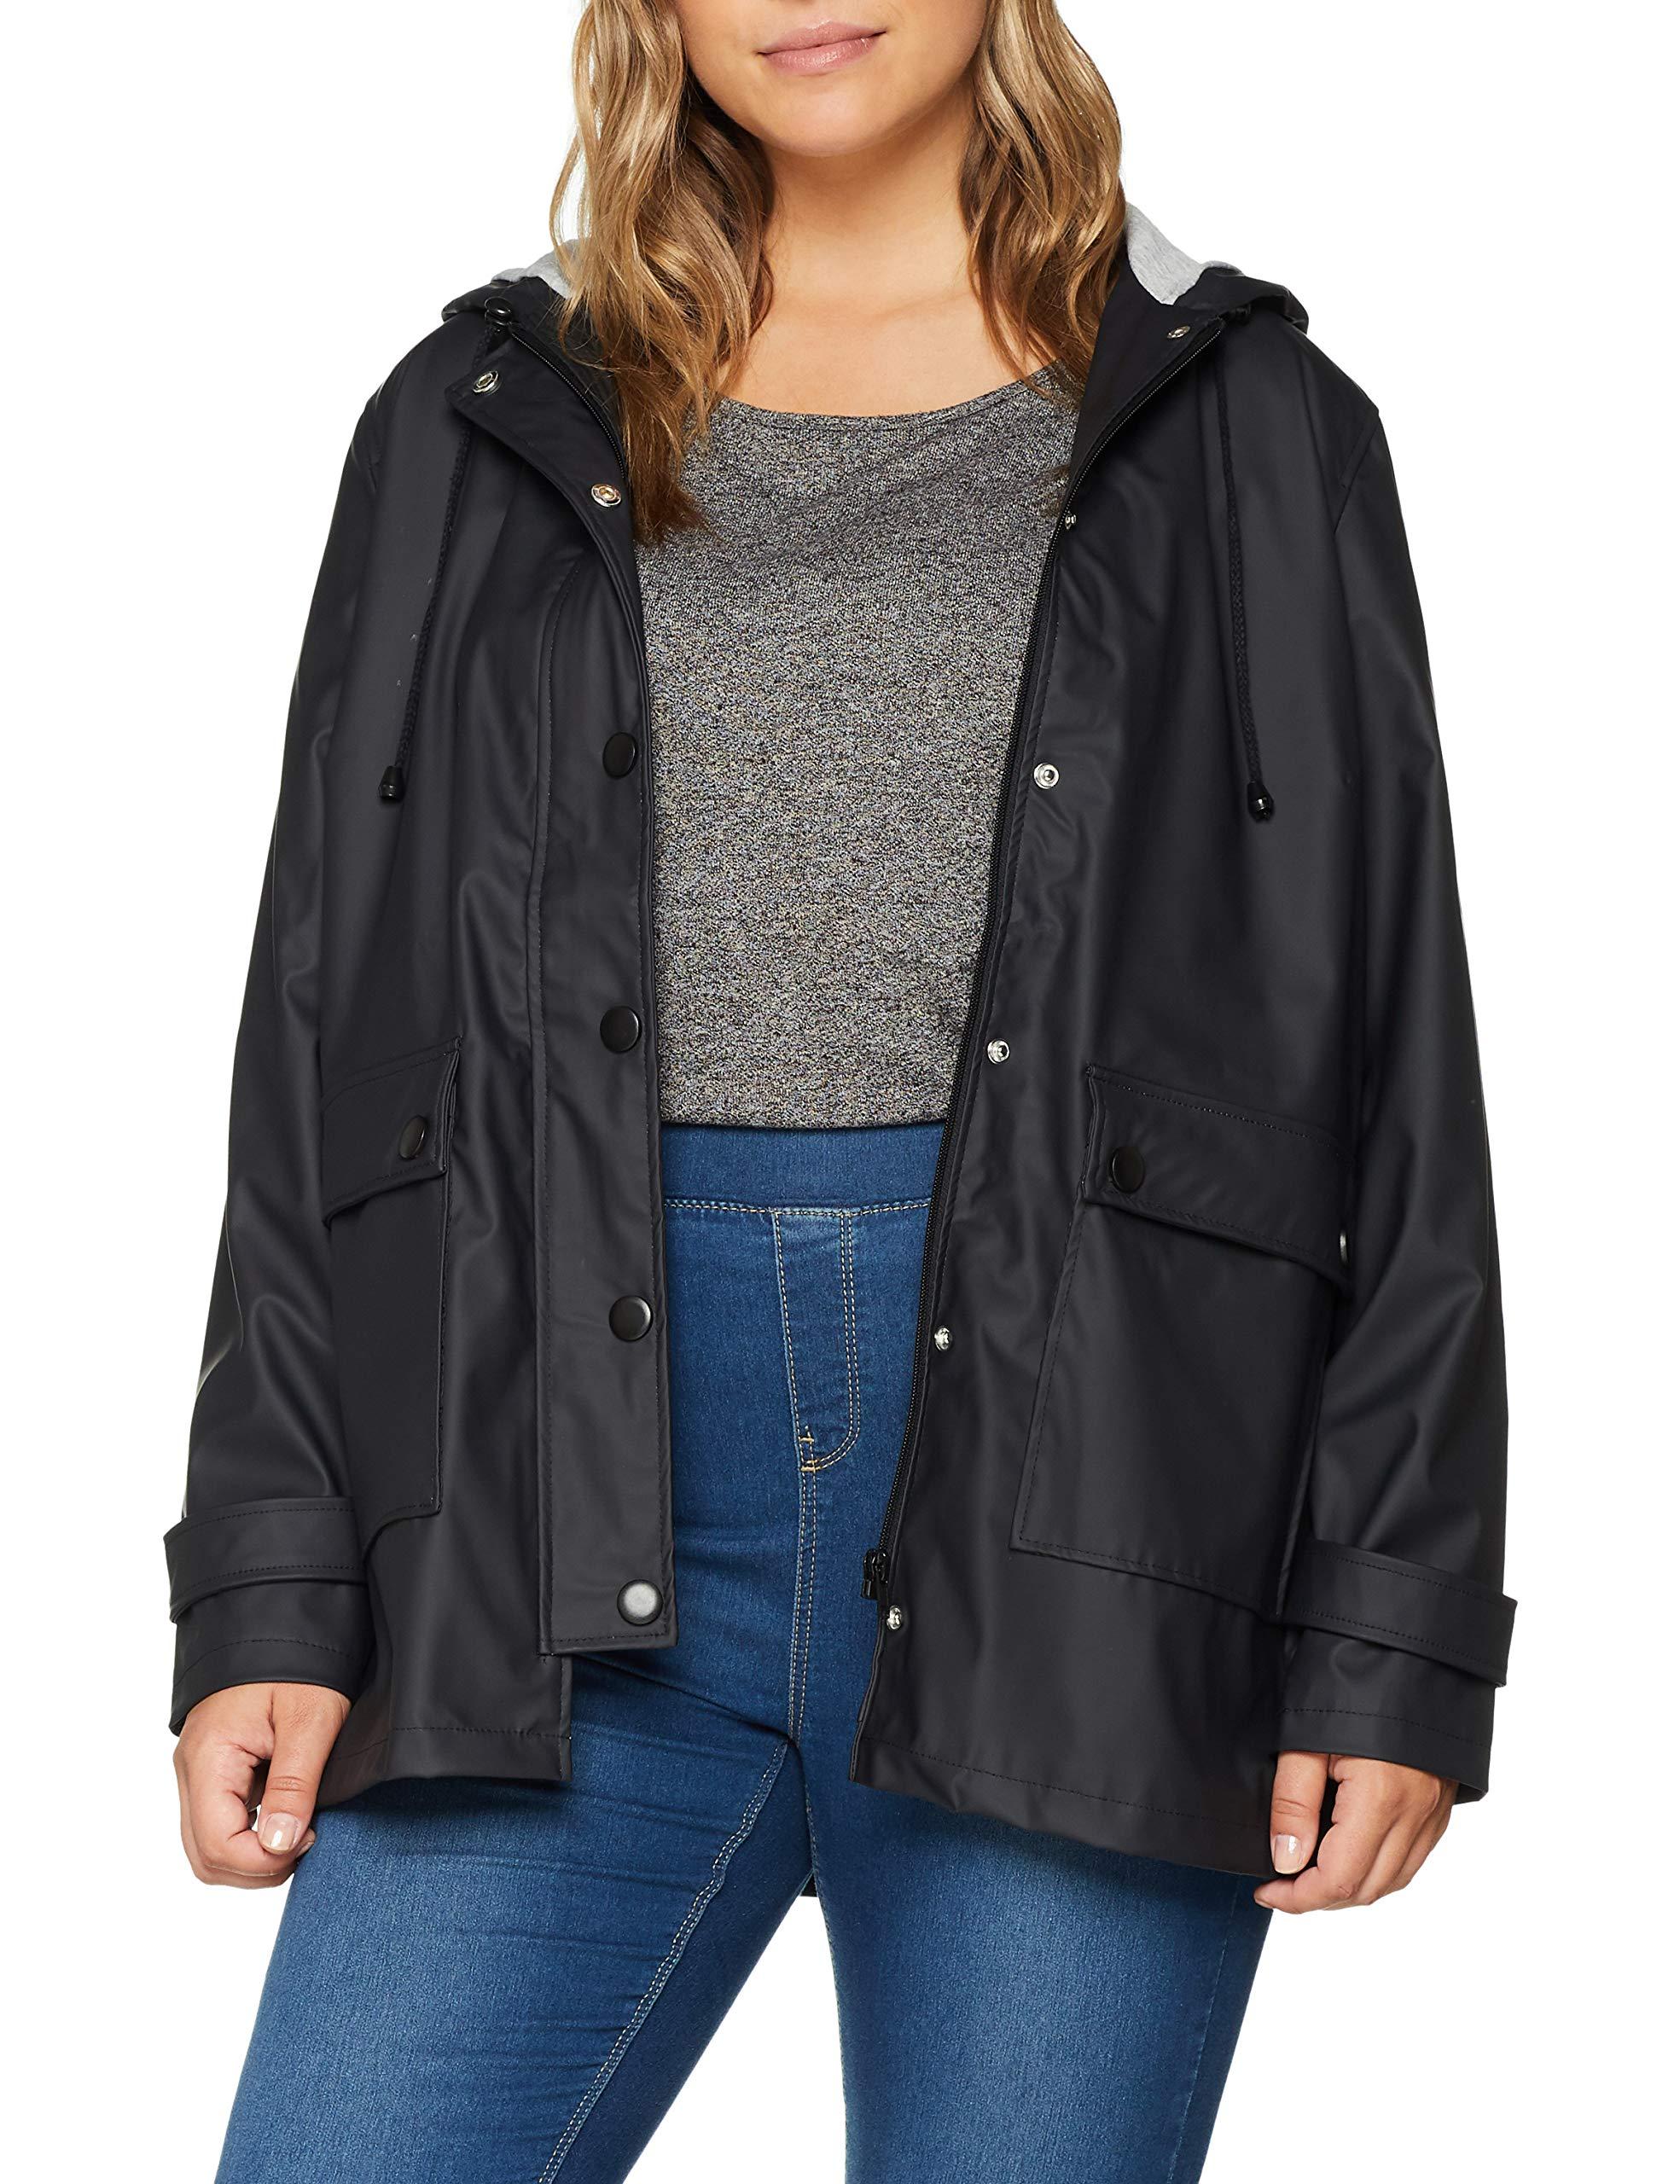 Simply Pu Be ImperméableNoir44 Femme Jacket Rain Manteau wn80vmN